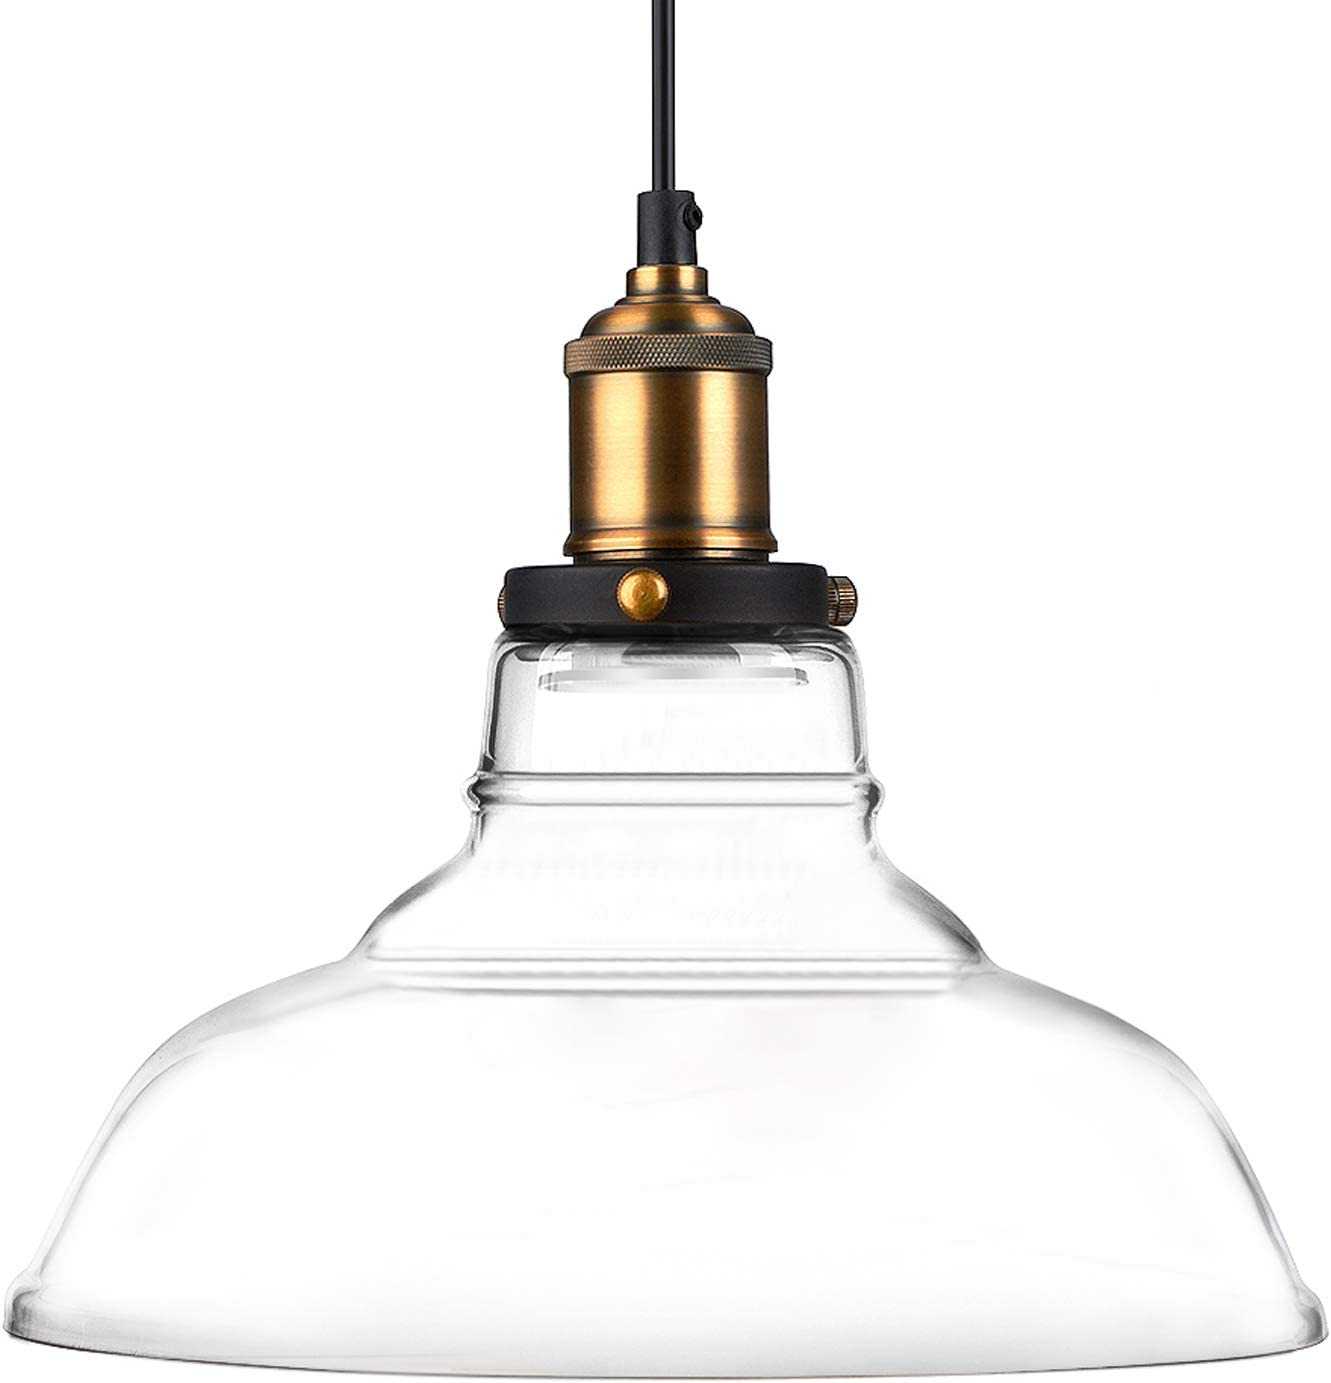 Oak Leaf Glass Pendant Lighting Fixture, Kitchen Ceiling Light Fixture Hanging Chandelier, Edison Vintage Style Lampshade with Adjustable Cord